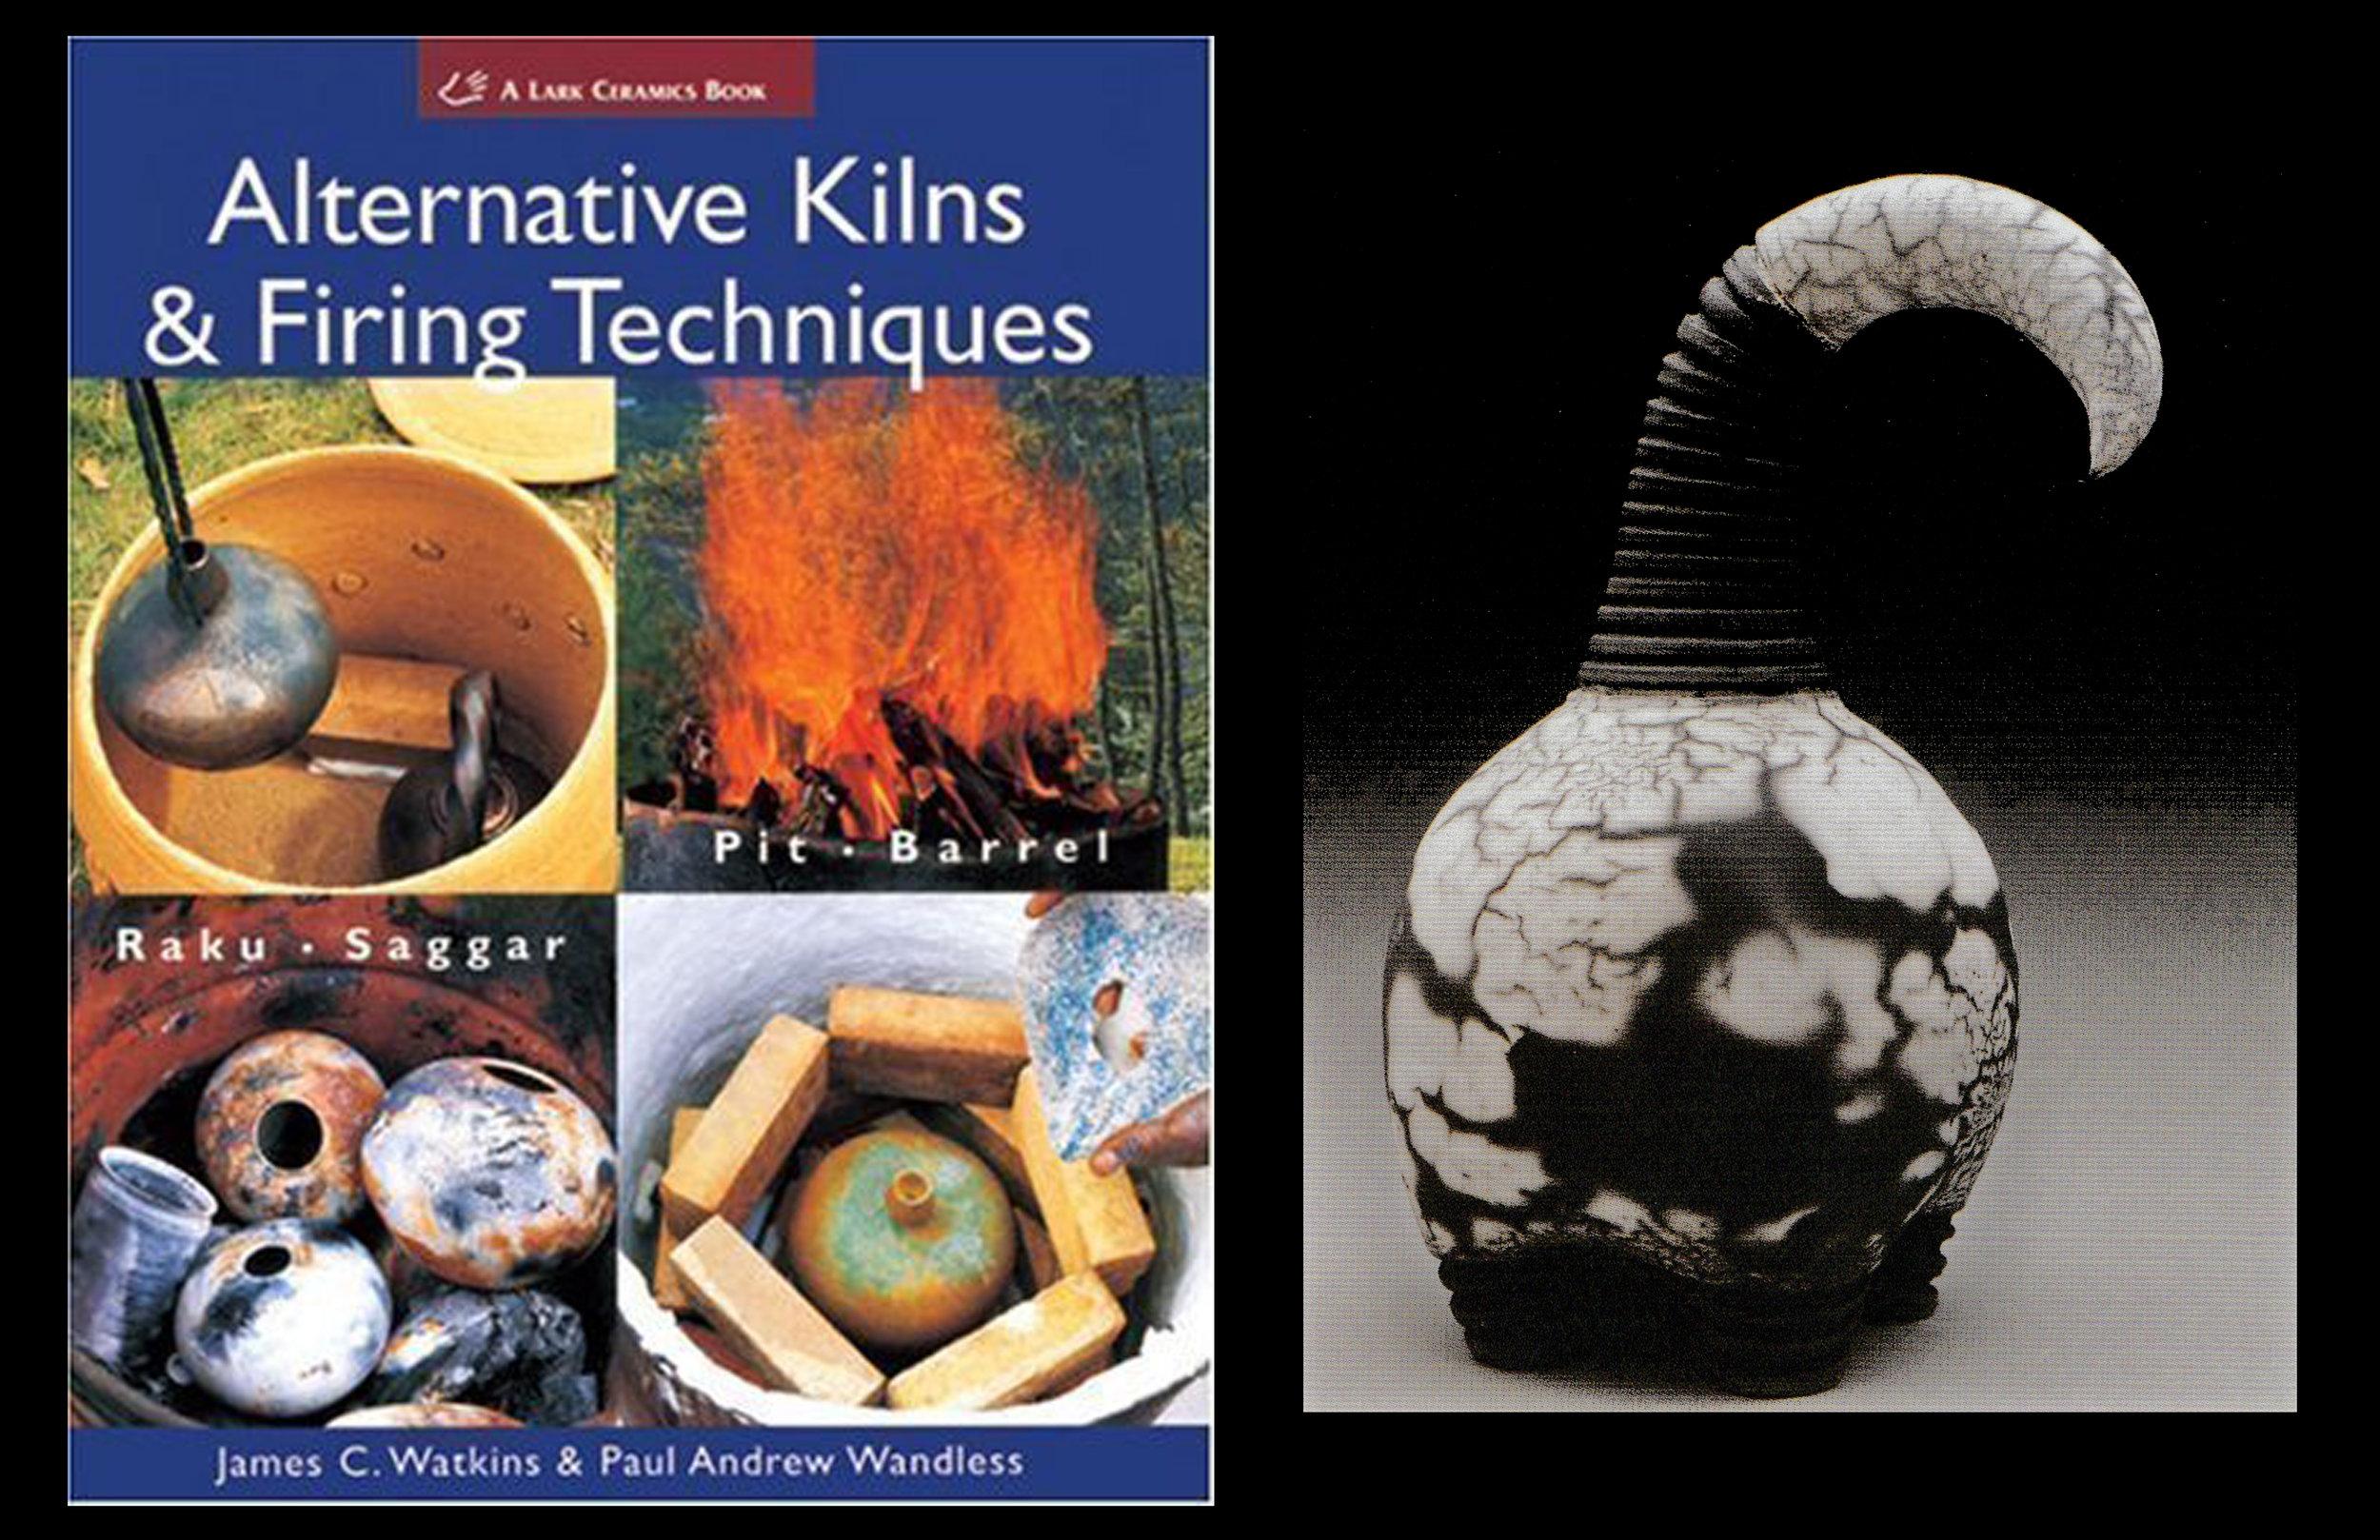 Alternative Kilns and Firing Techniques: Raku, Saggar, Pit, Barrel  By James C. Watkins and Paul Wandless